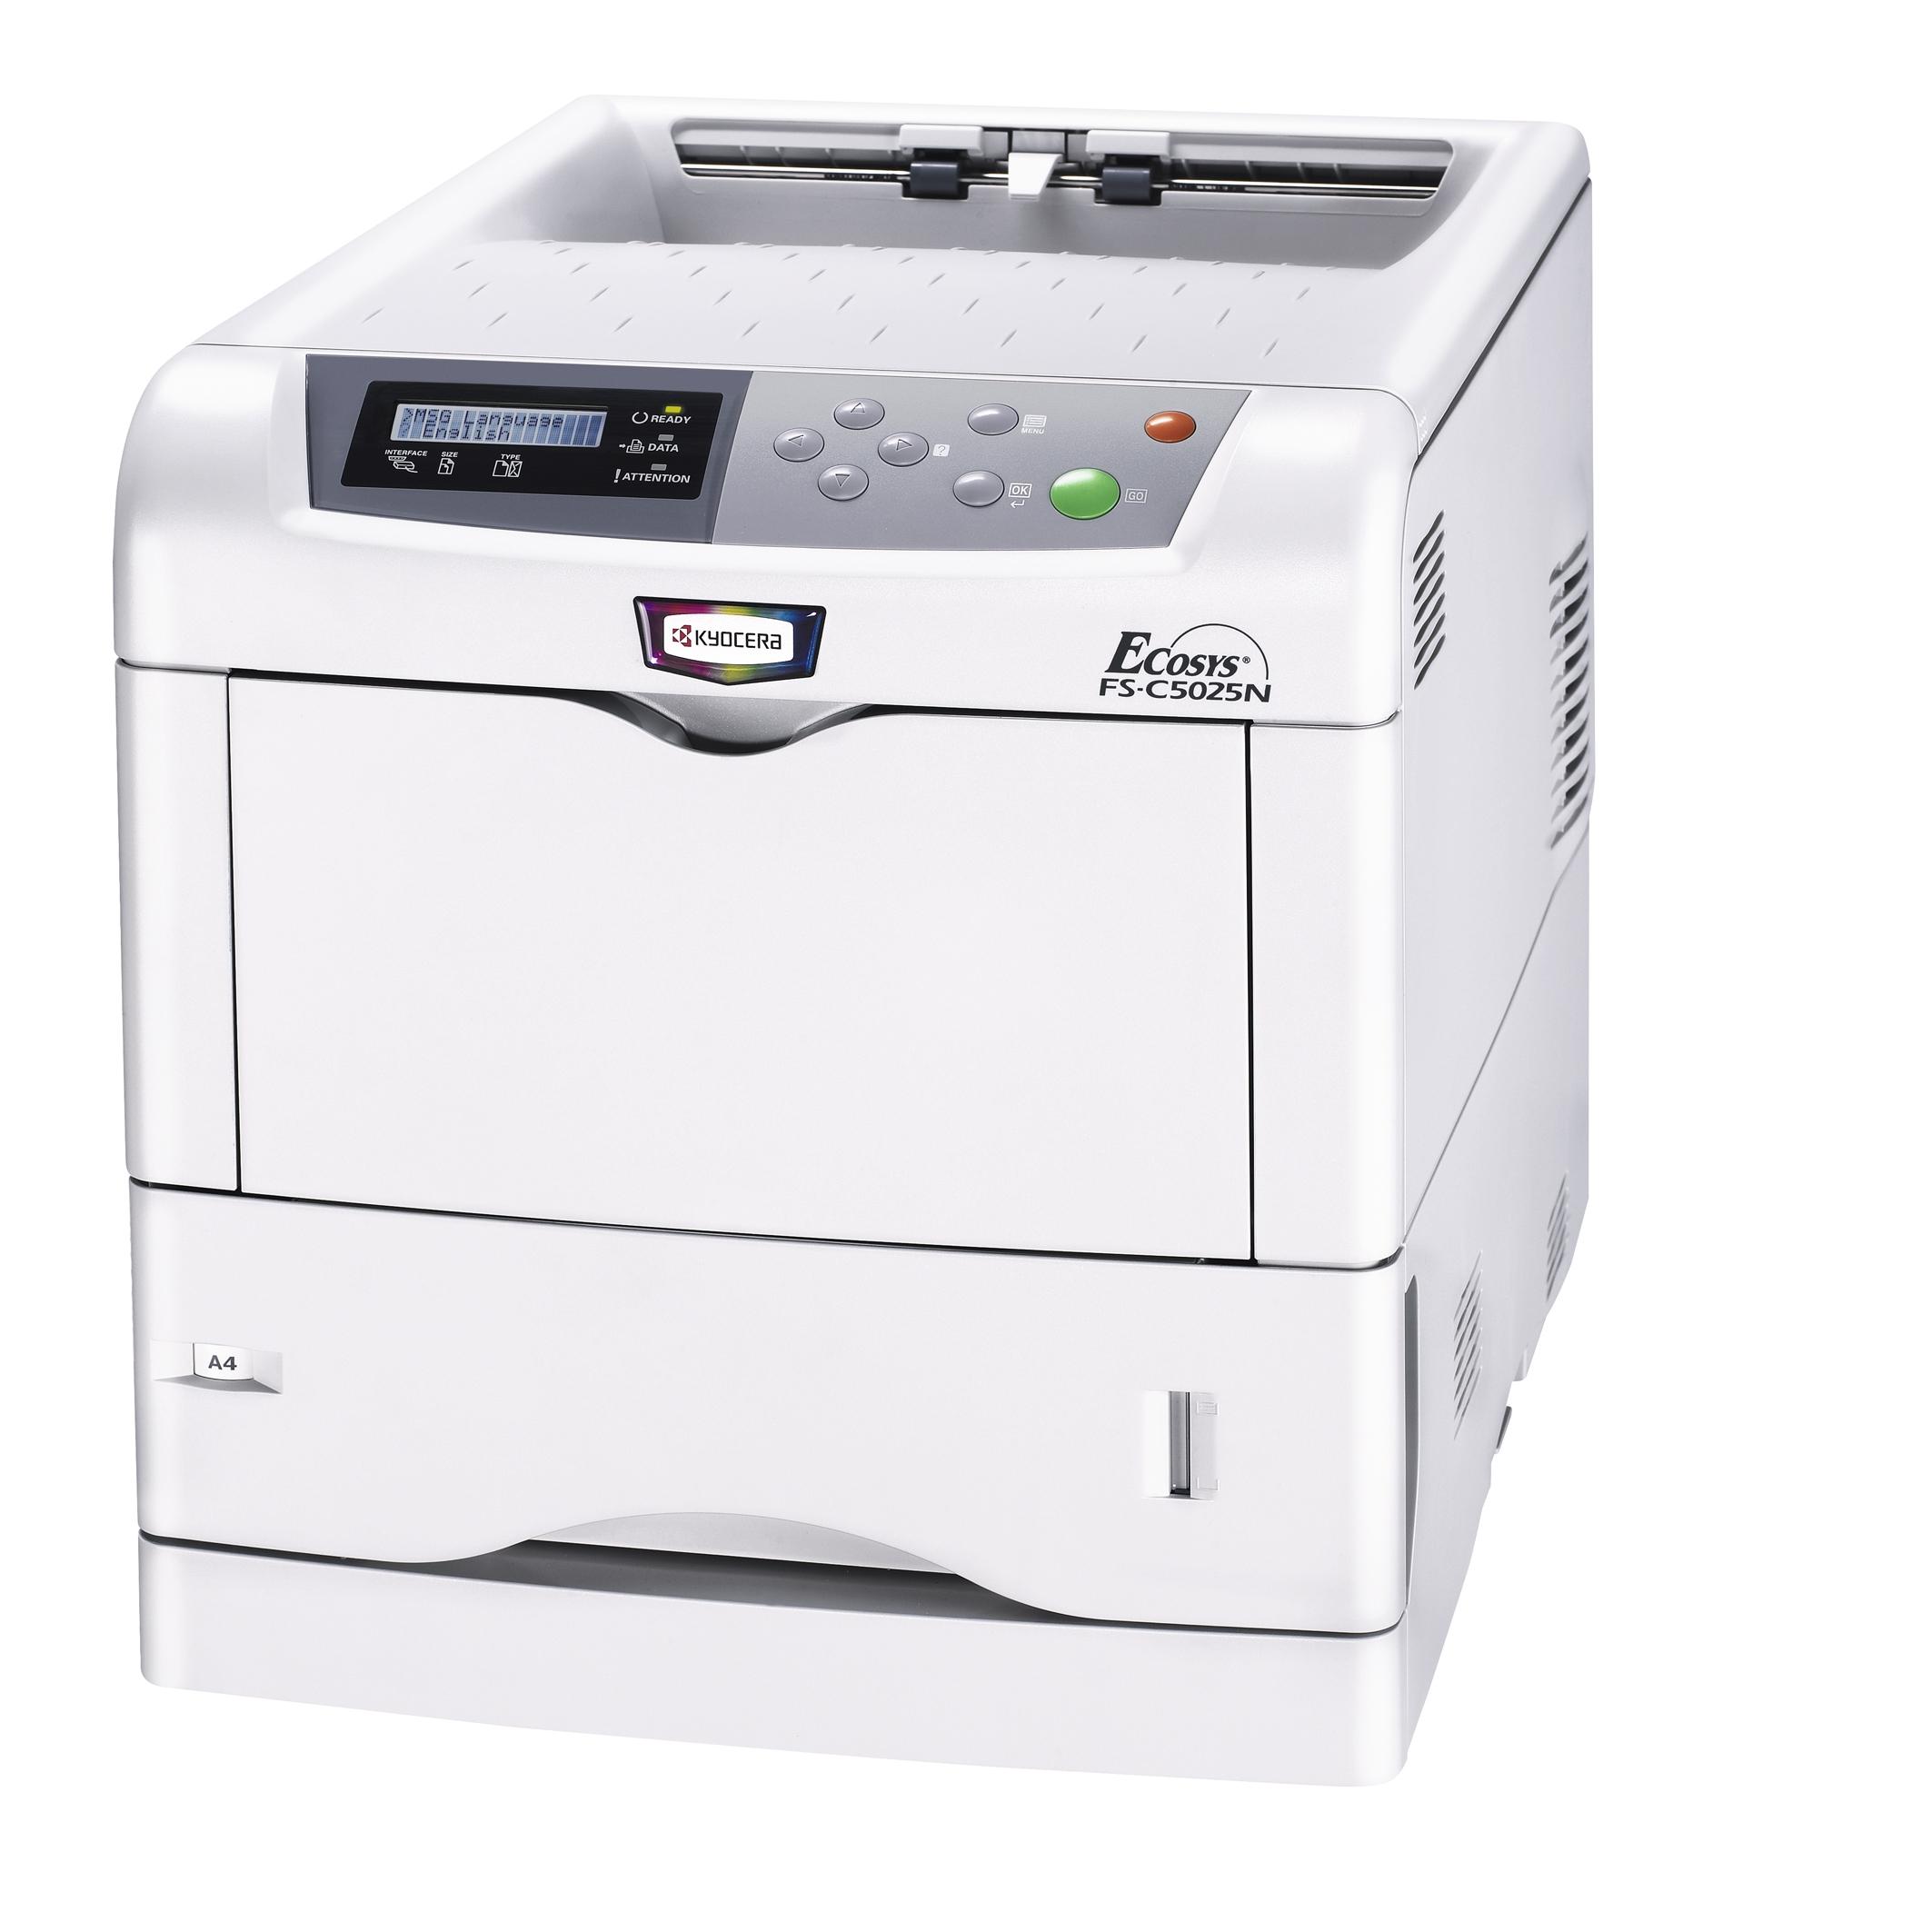 Заправка принтера Kyocera FS 5025N